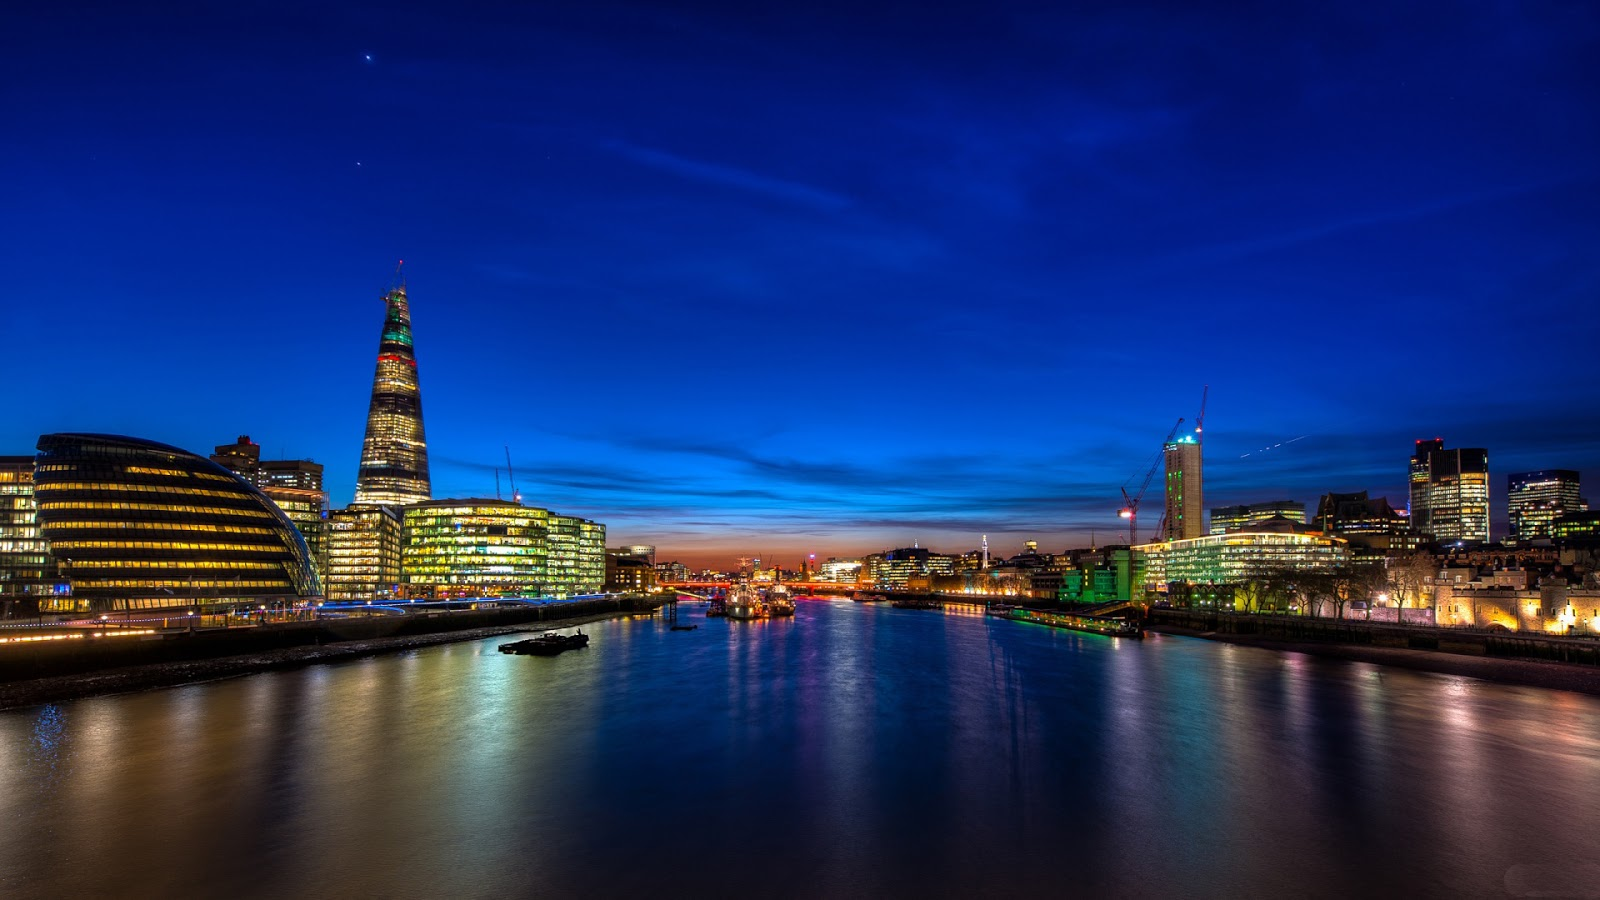 london hd images - photo #20